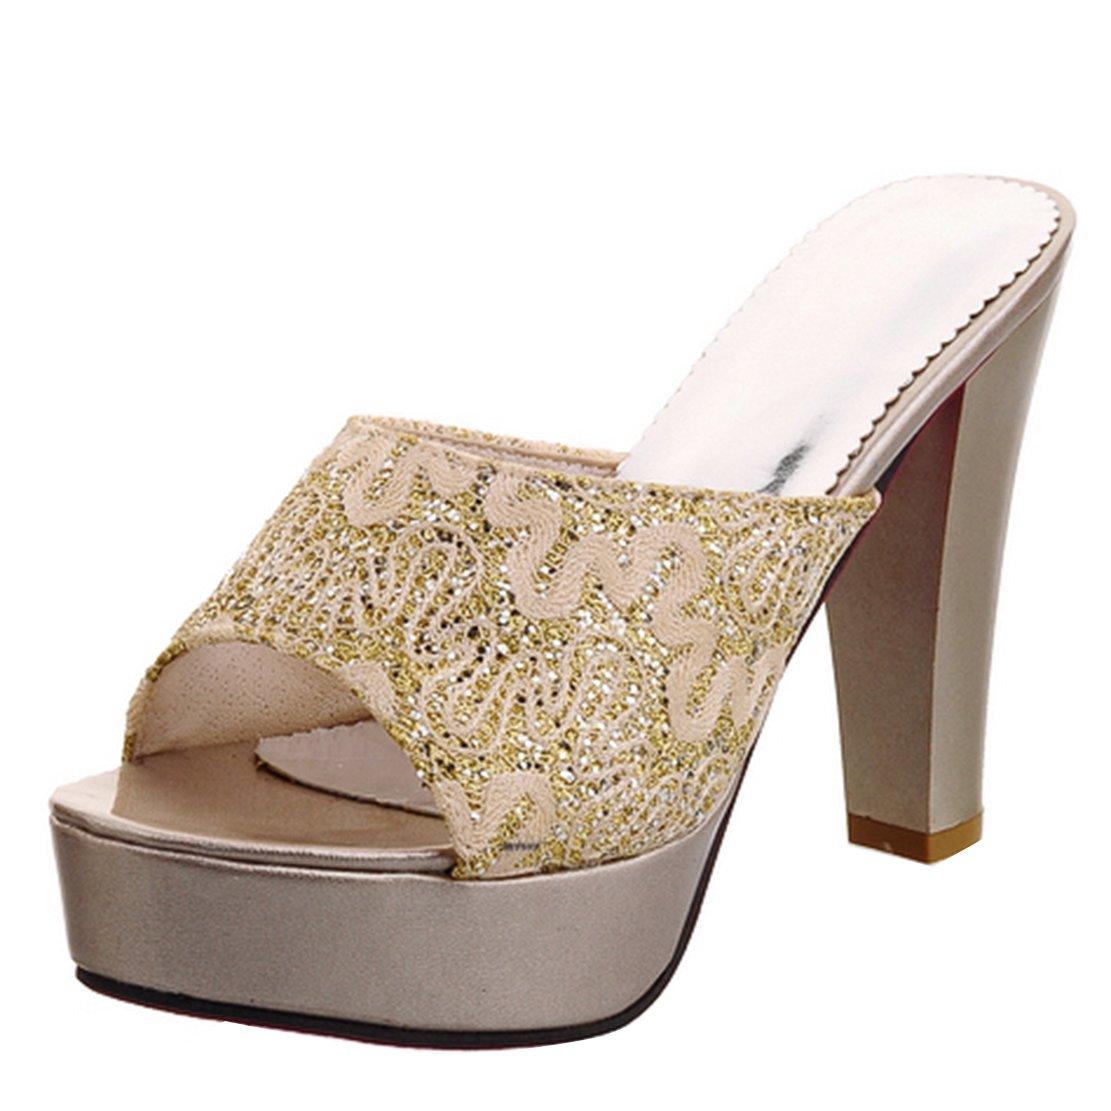 AIYOUMEI Damen Peep Toe Blockabsatz Heel Plateau Pantoletten mit Glitzer und Spitz Bequem Modern Sandalen Schuhe  36 EU|Gold